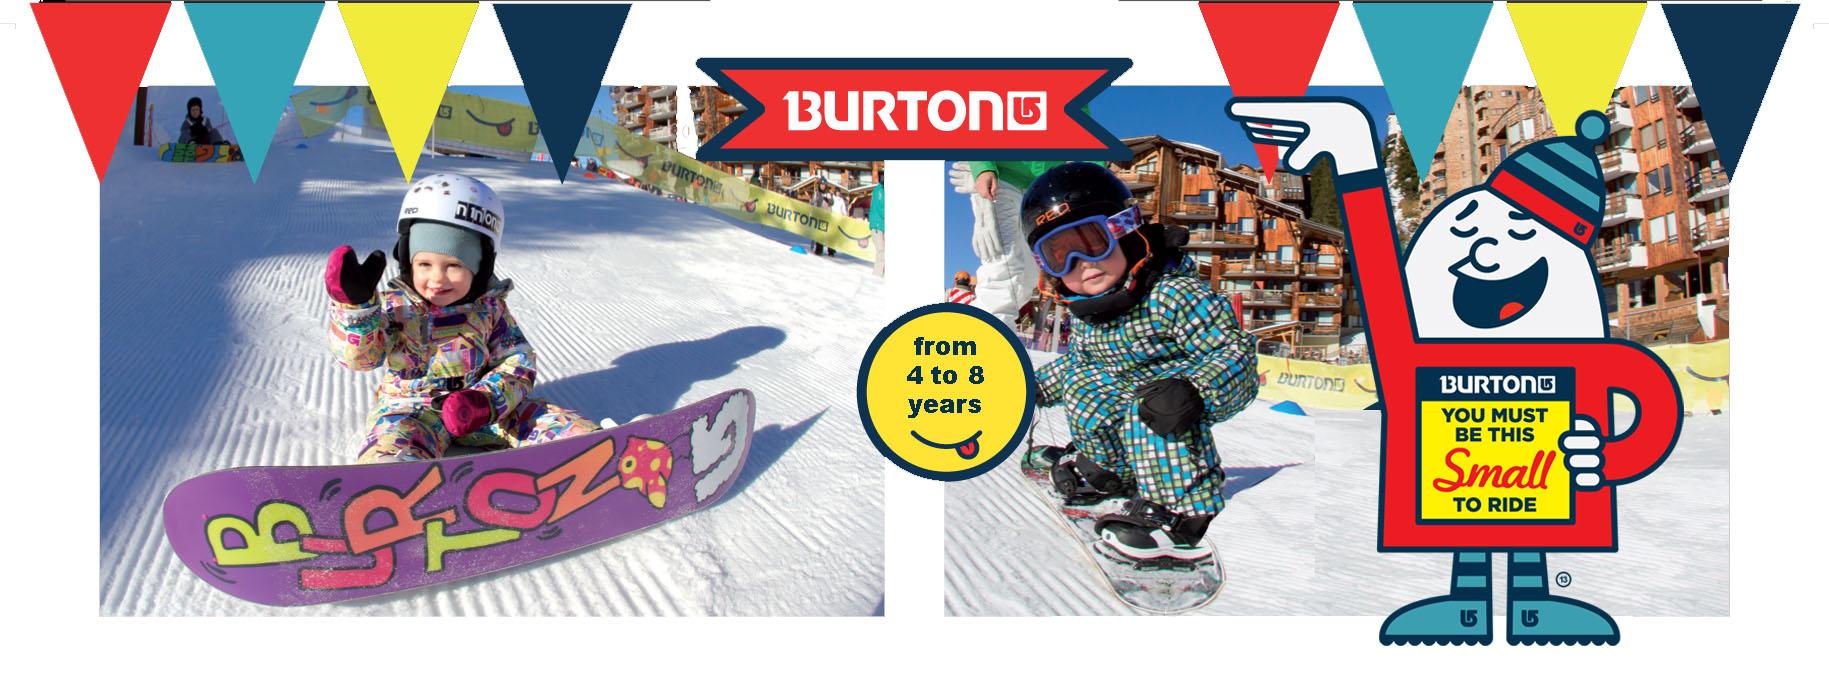 burton kids snowboarding riglet